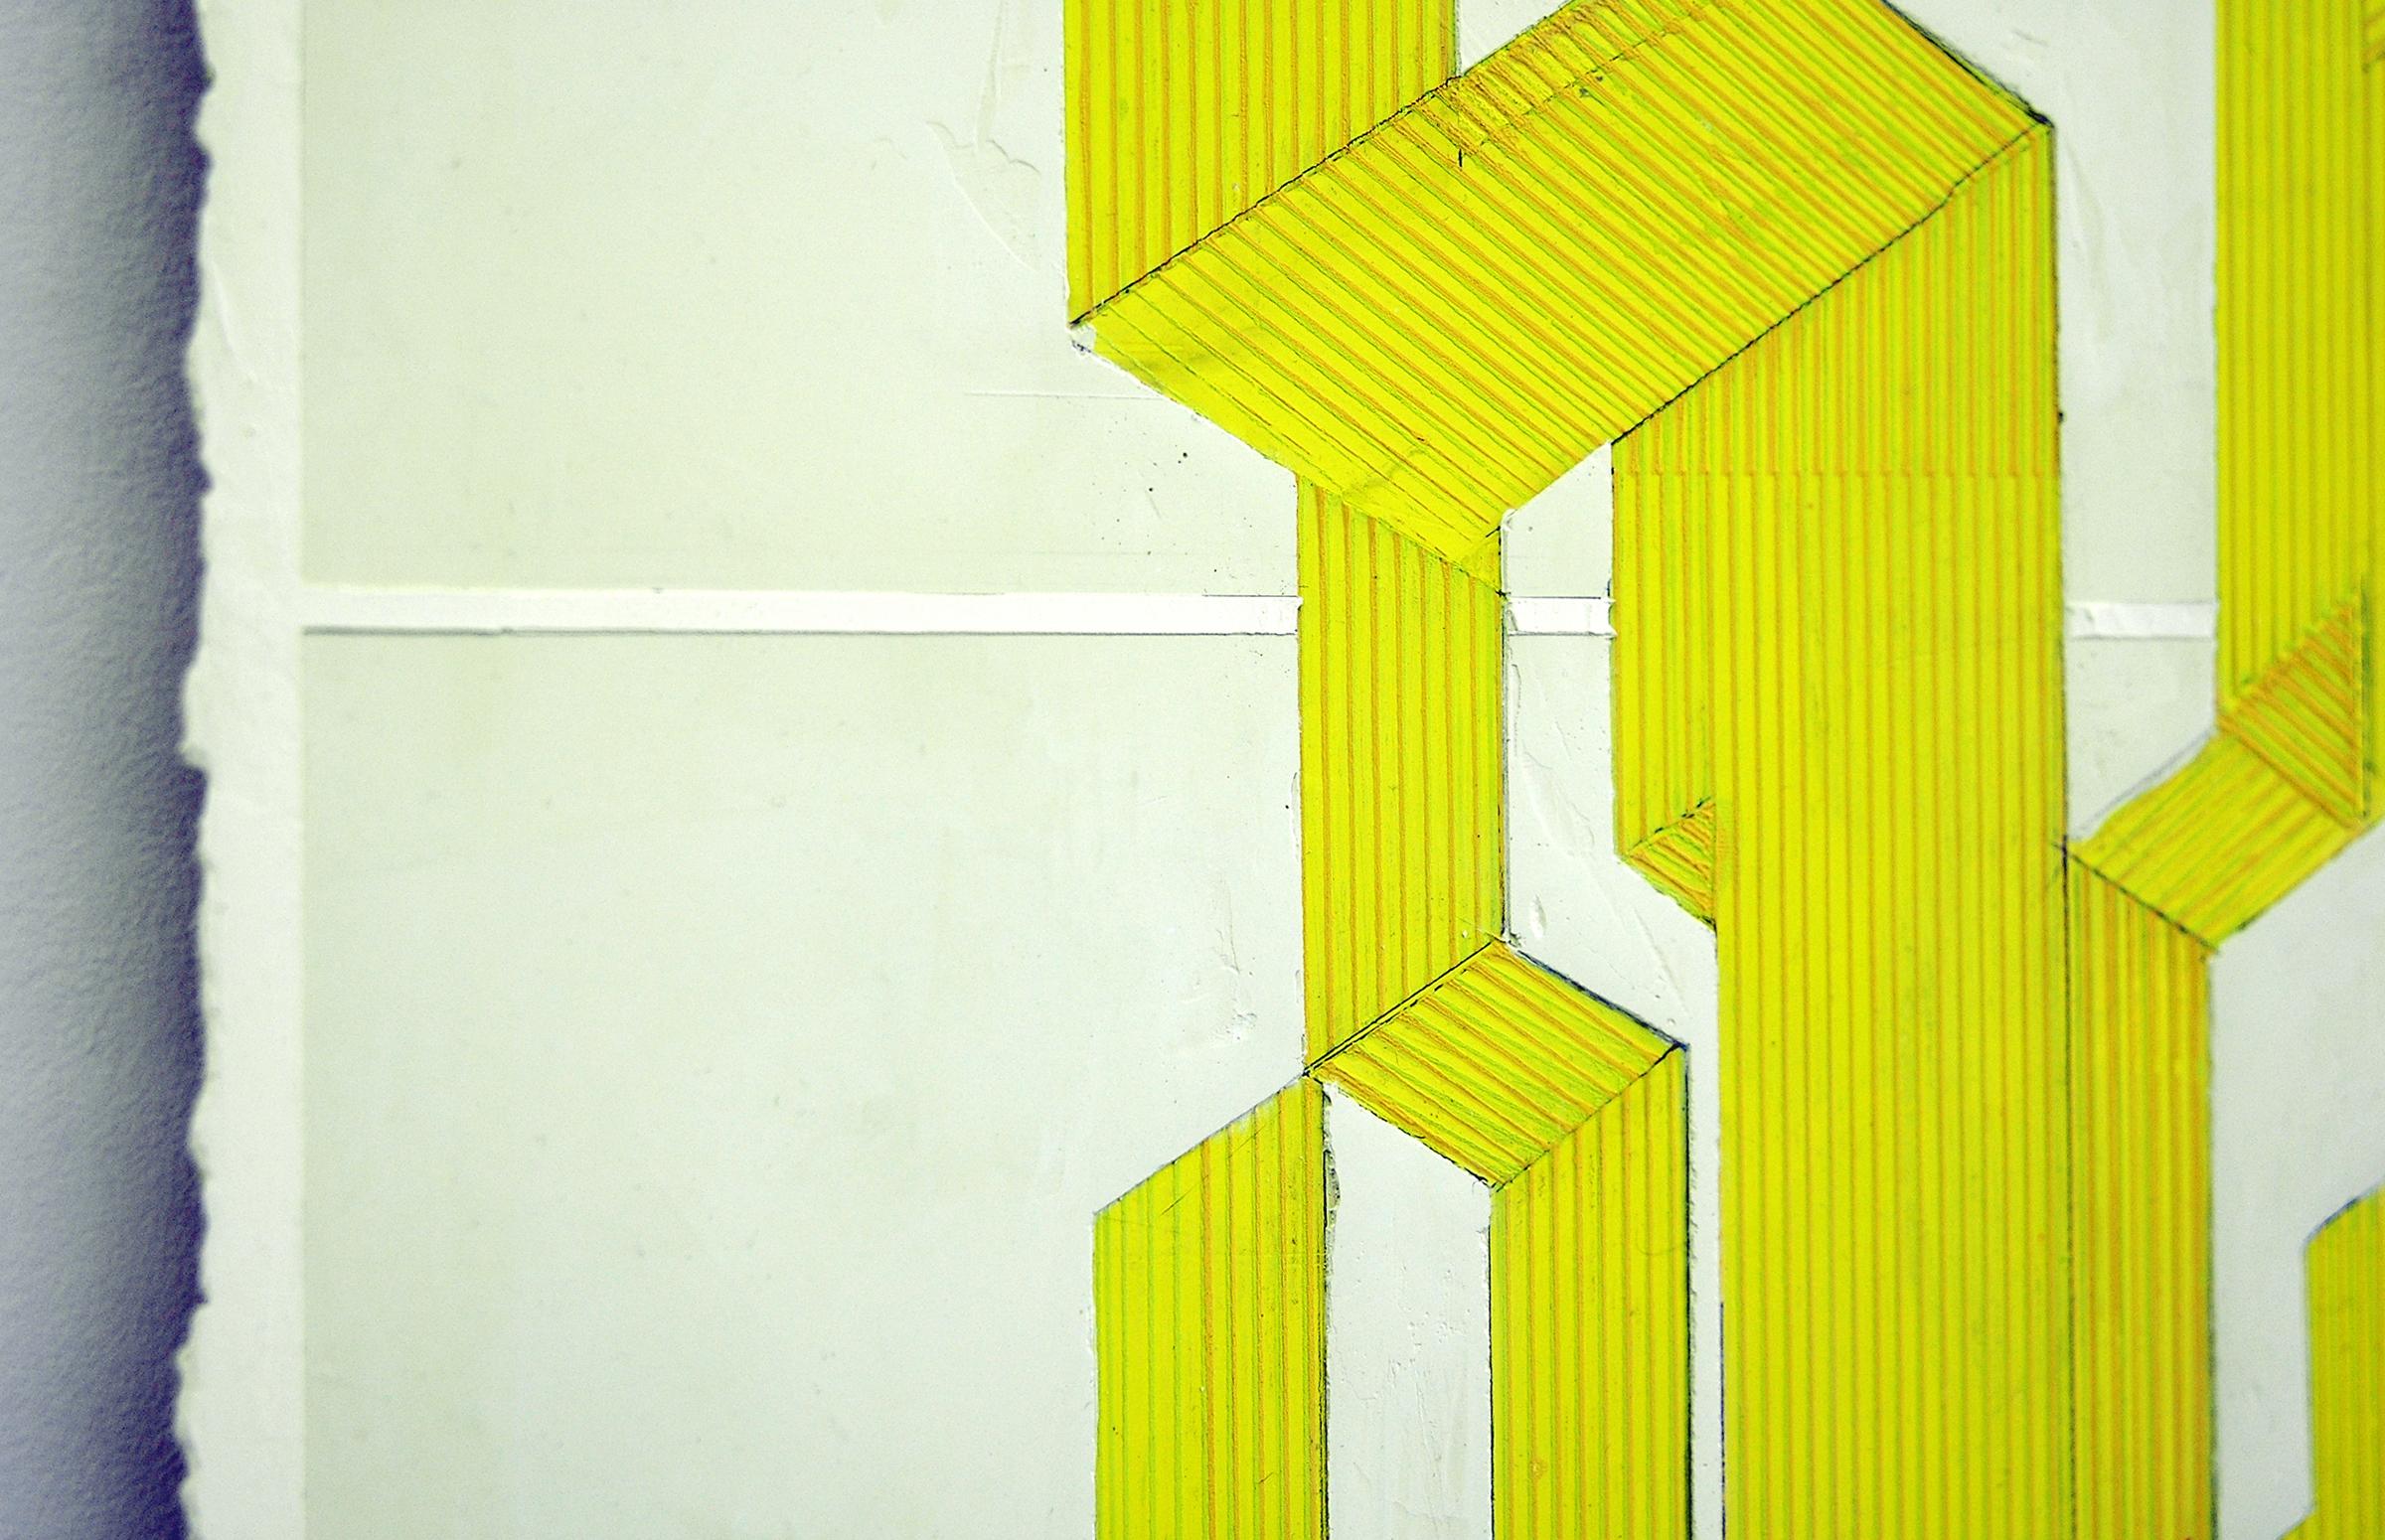 "ELISE FERGUSON  (detail) Table , pigmented plaster on MDF panel, 36"" x 24"", 2014"